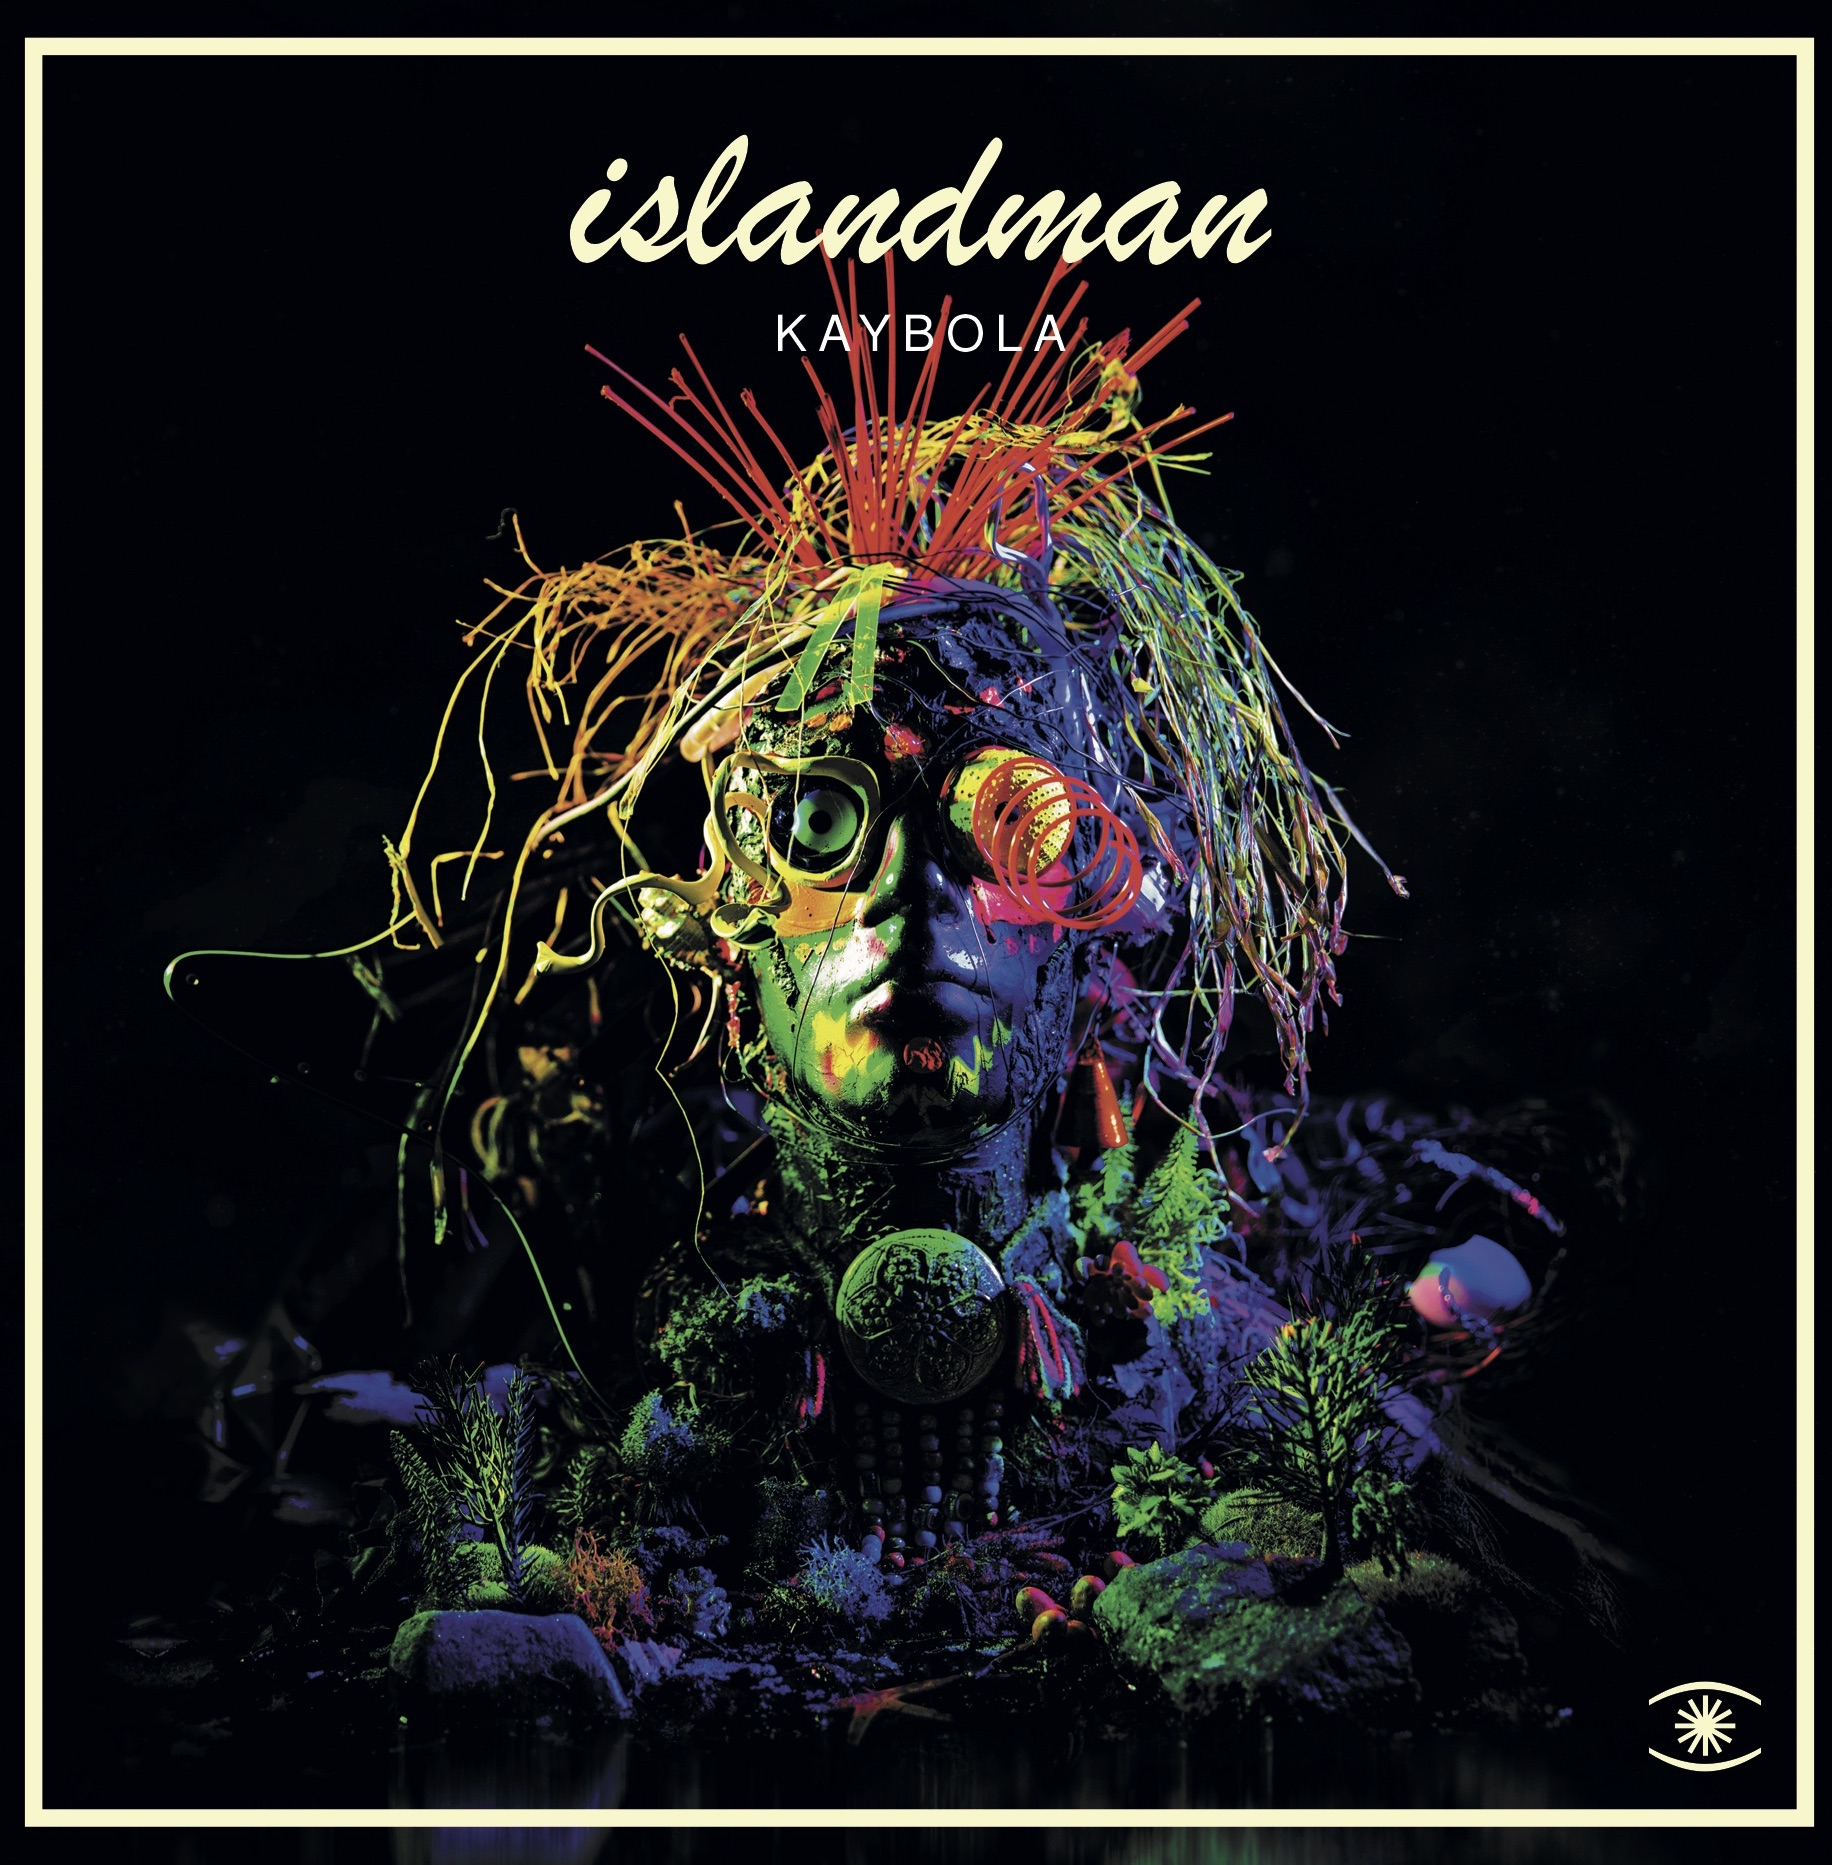 Islandman/KAYROLA DLP